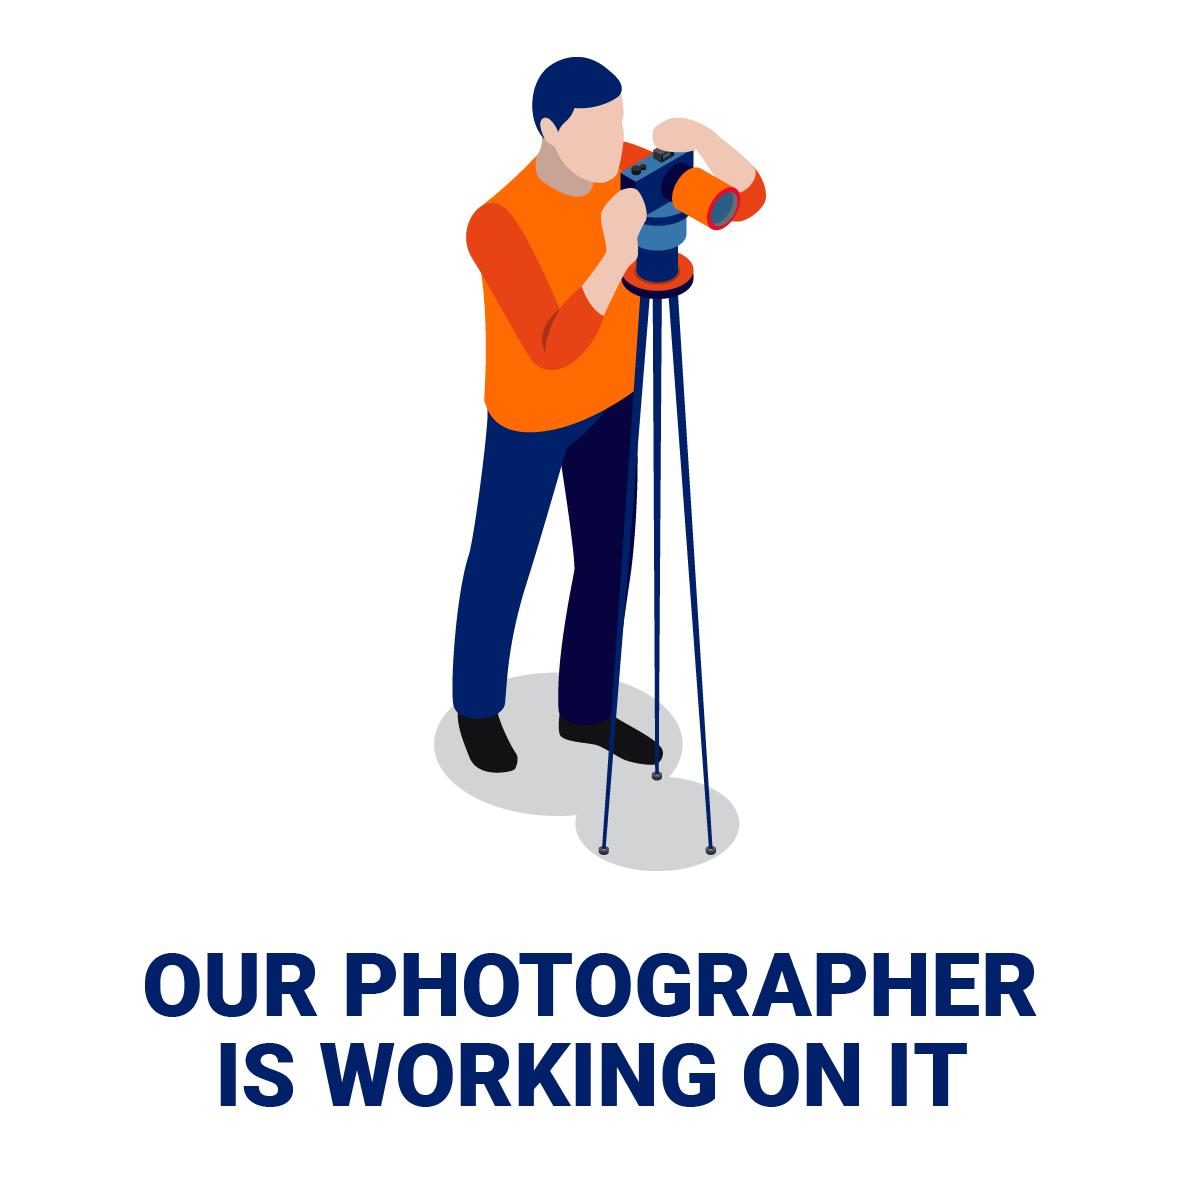 PK3RJ GPU 2